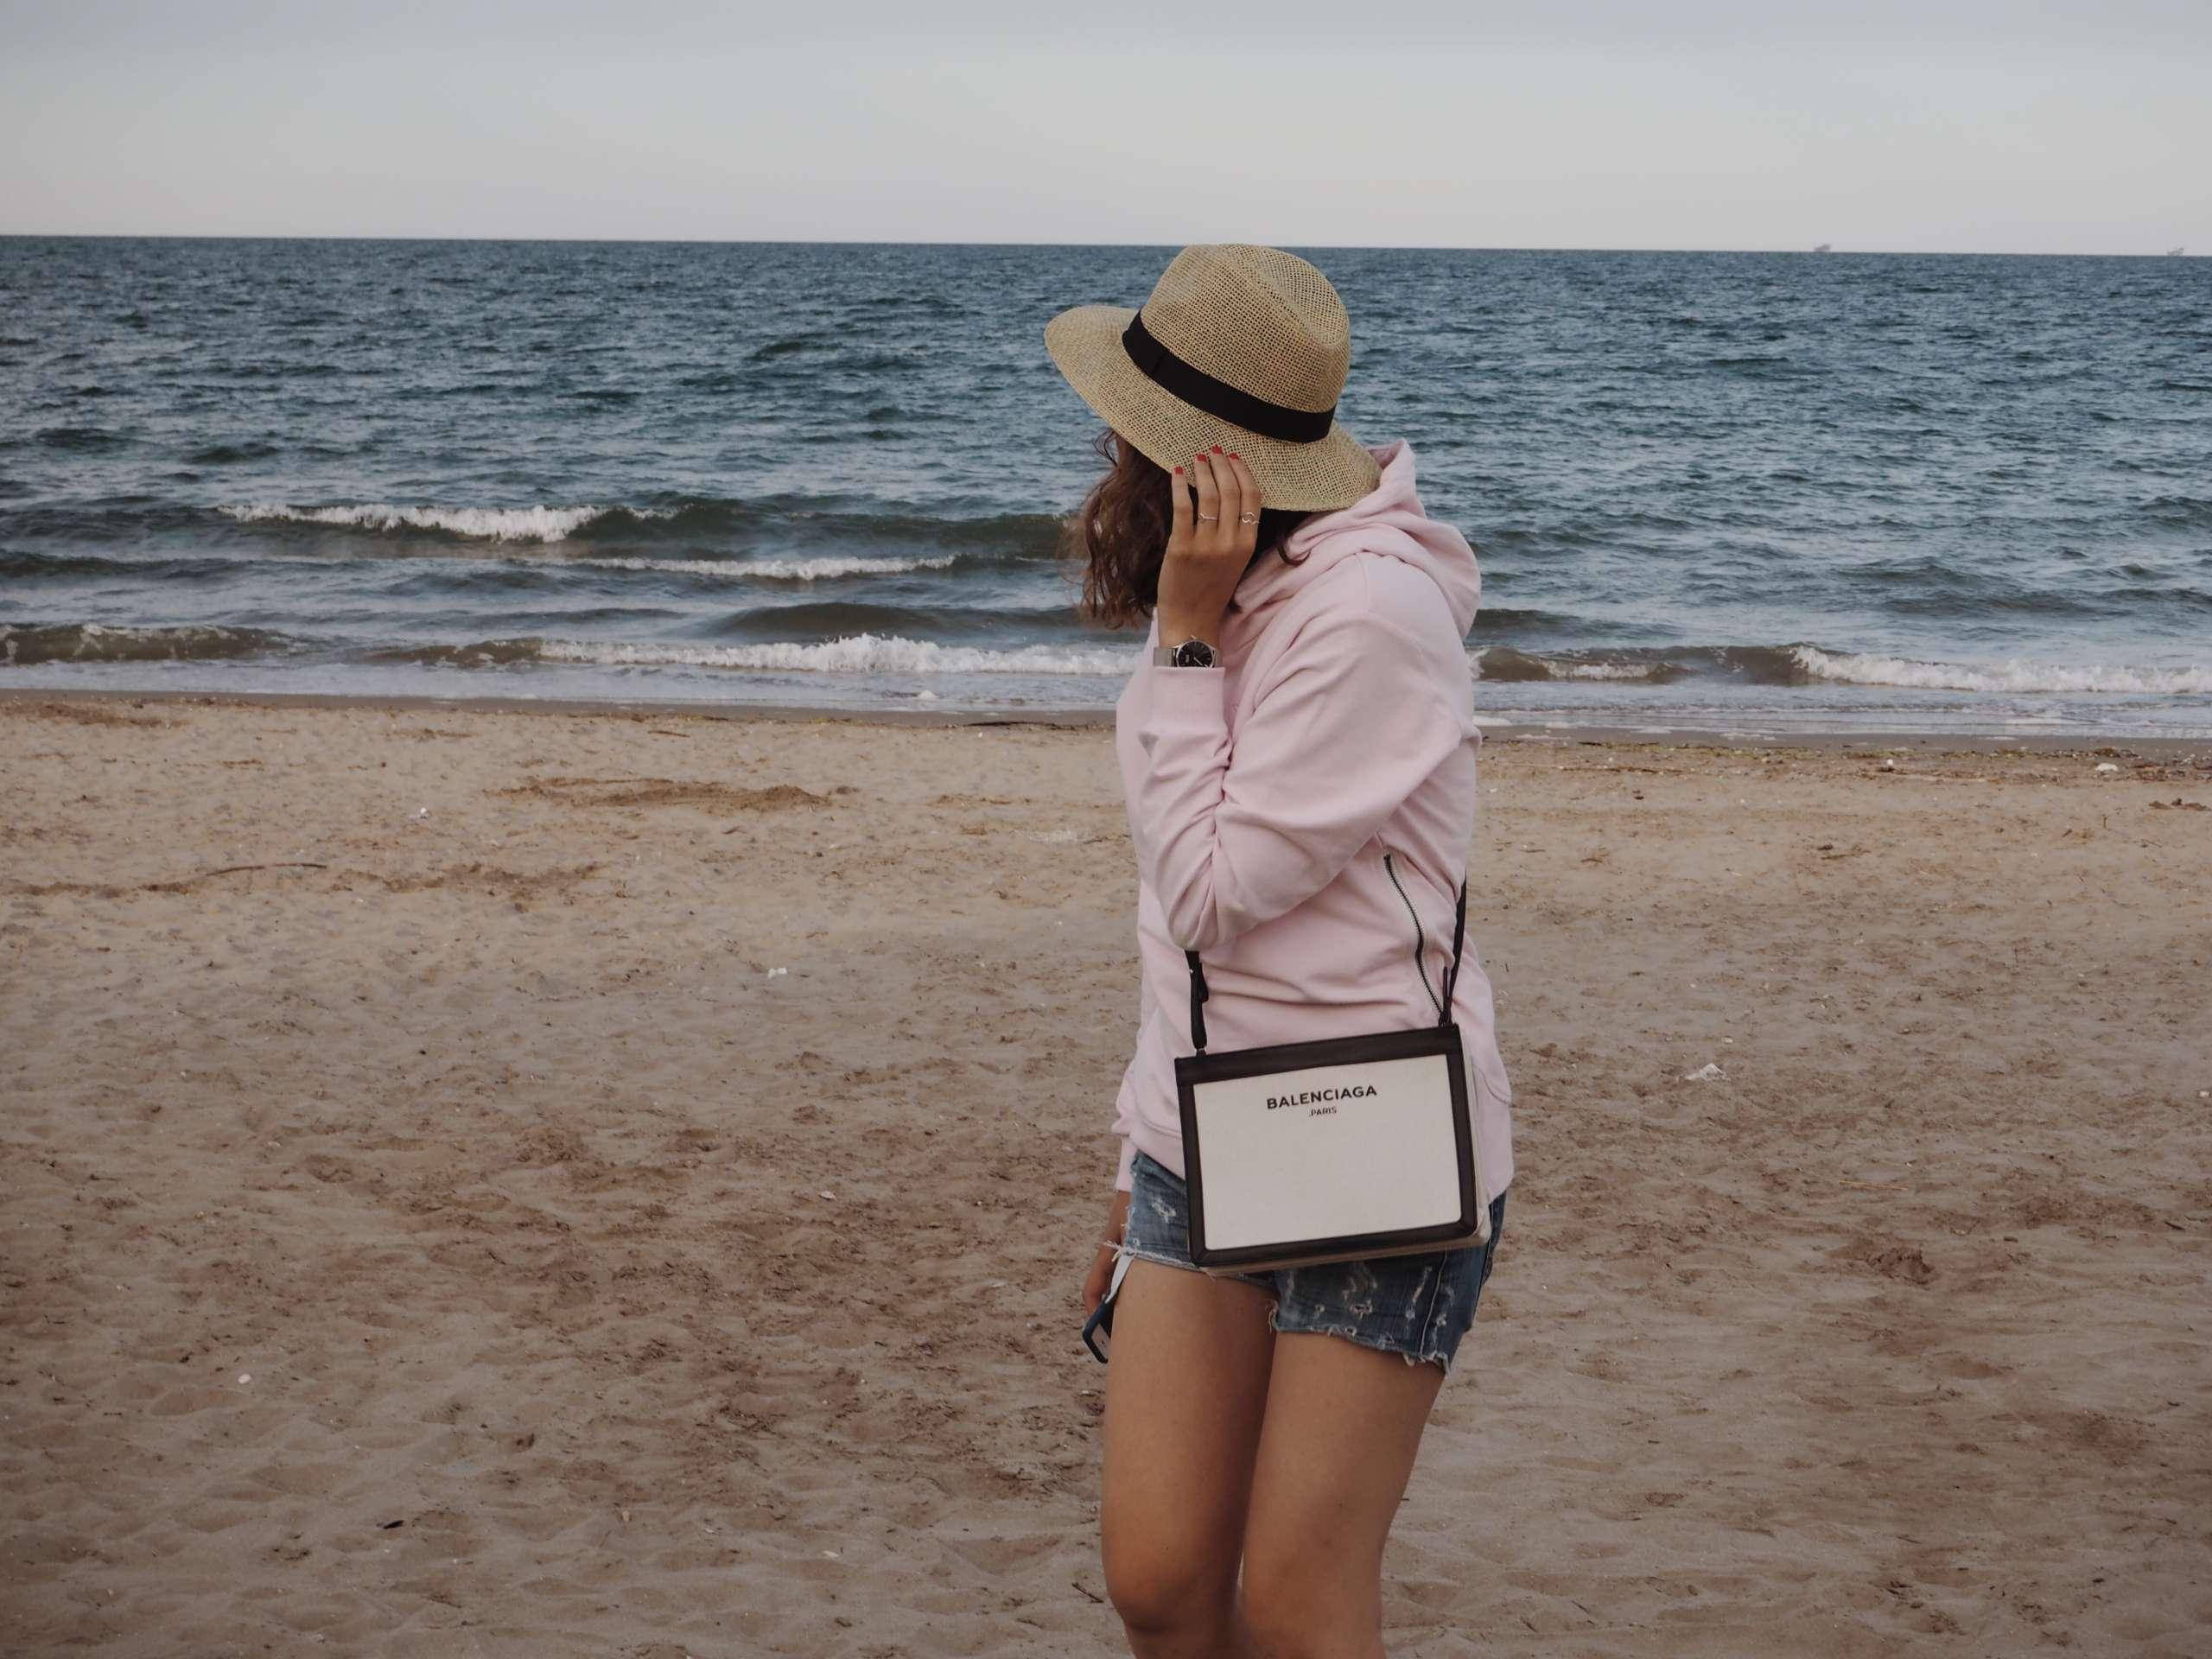 baretto-marina-romea-beach-club-hoodie-Italy-laura-gravestock- nicole-vienna-onepiece-otterbox-phone-case-summer-balenciaga